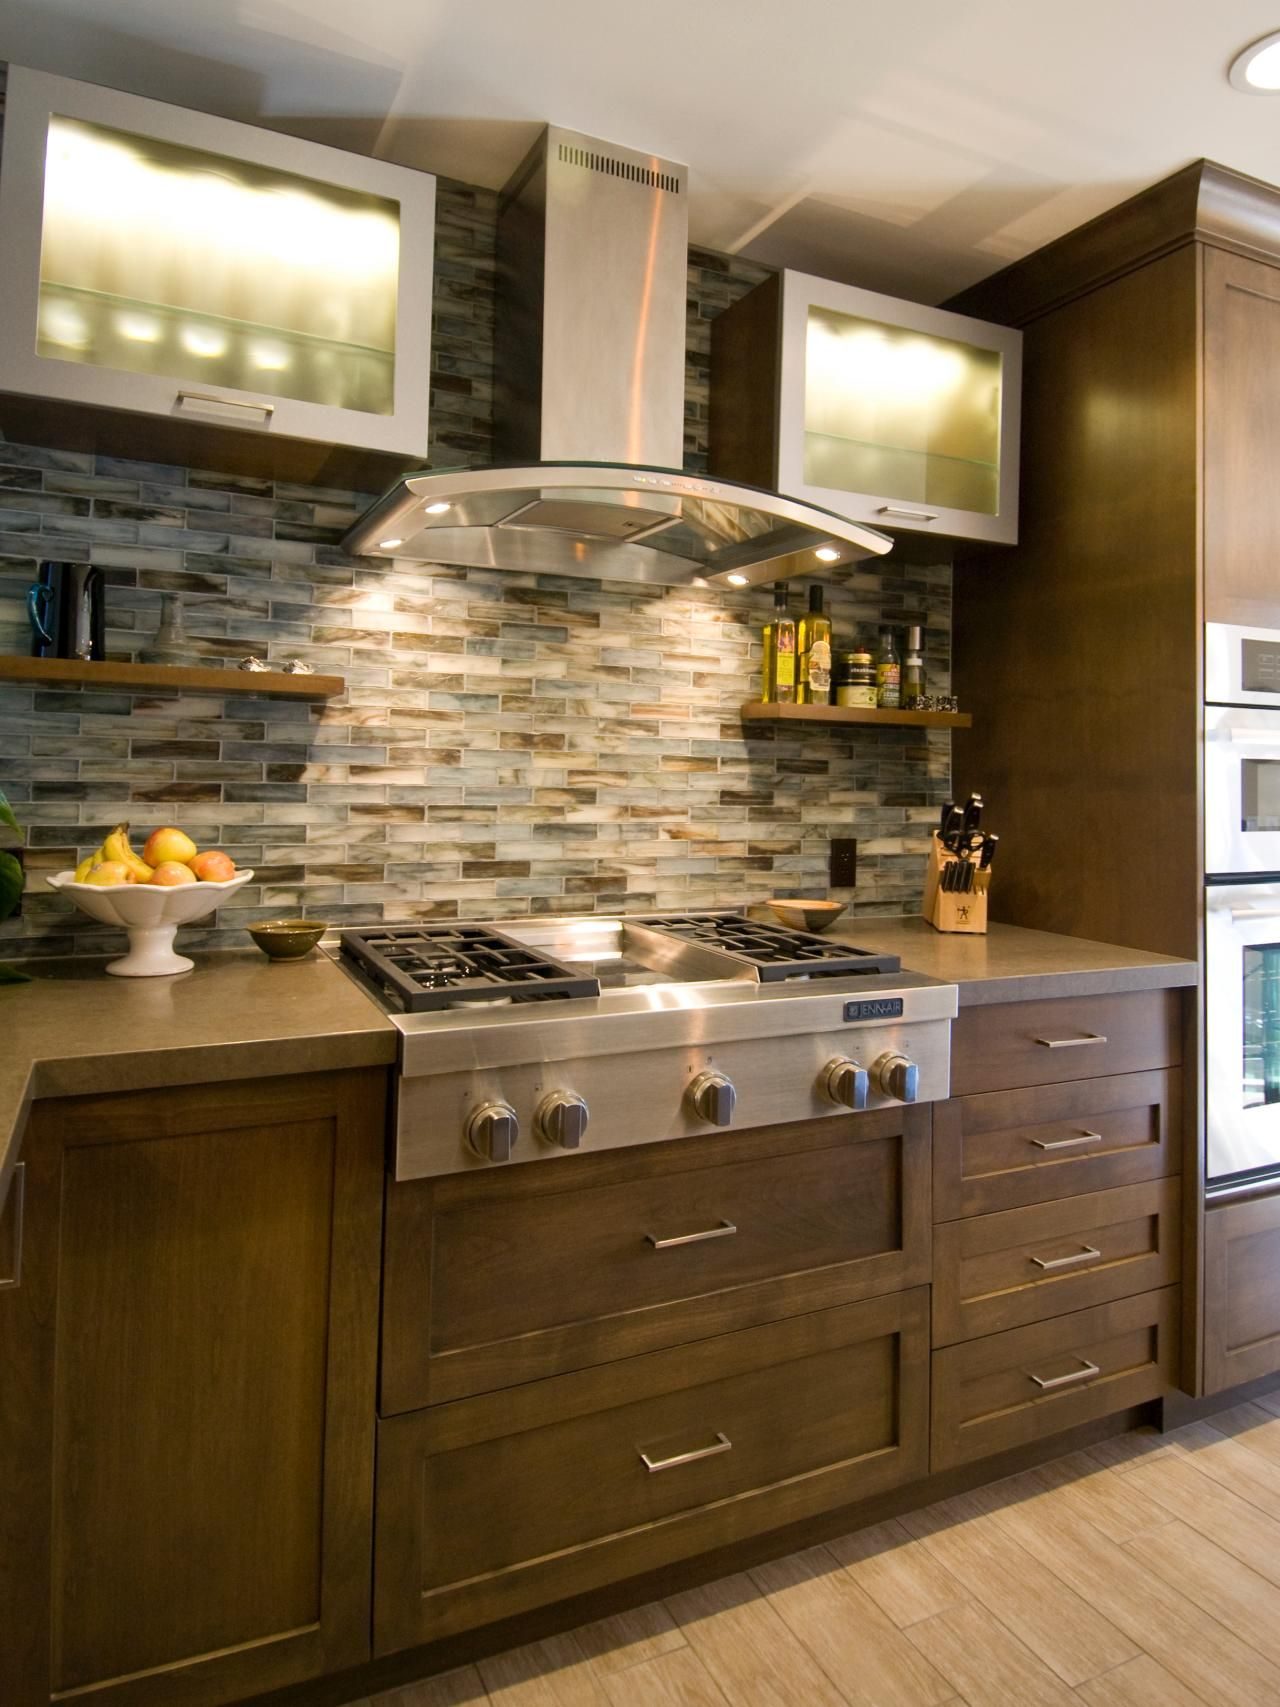 Cool Backsplash Ideas | Funky kitchen